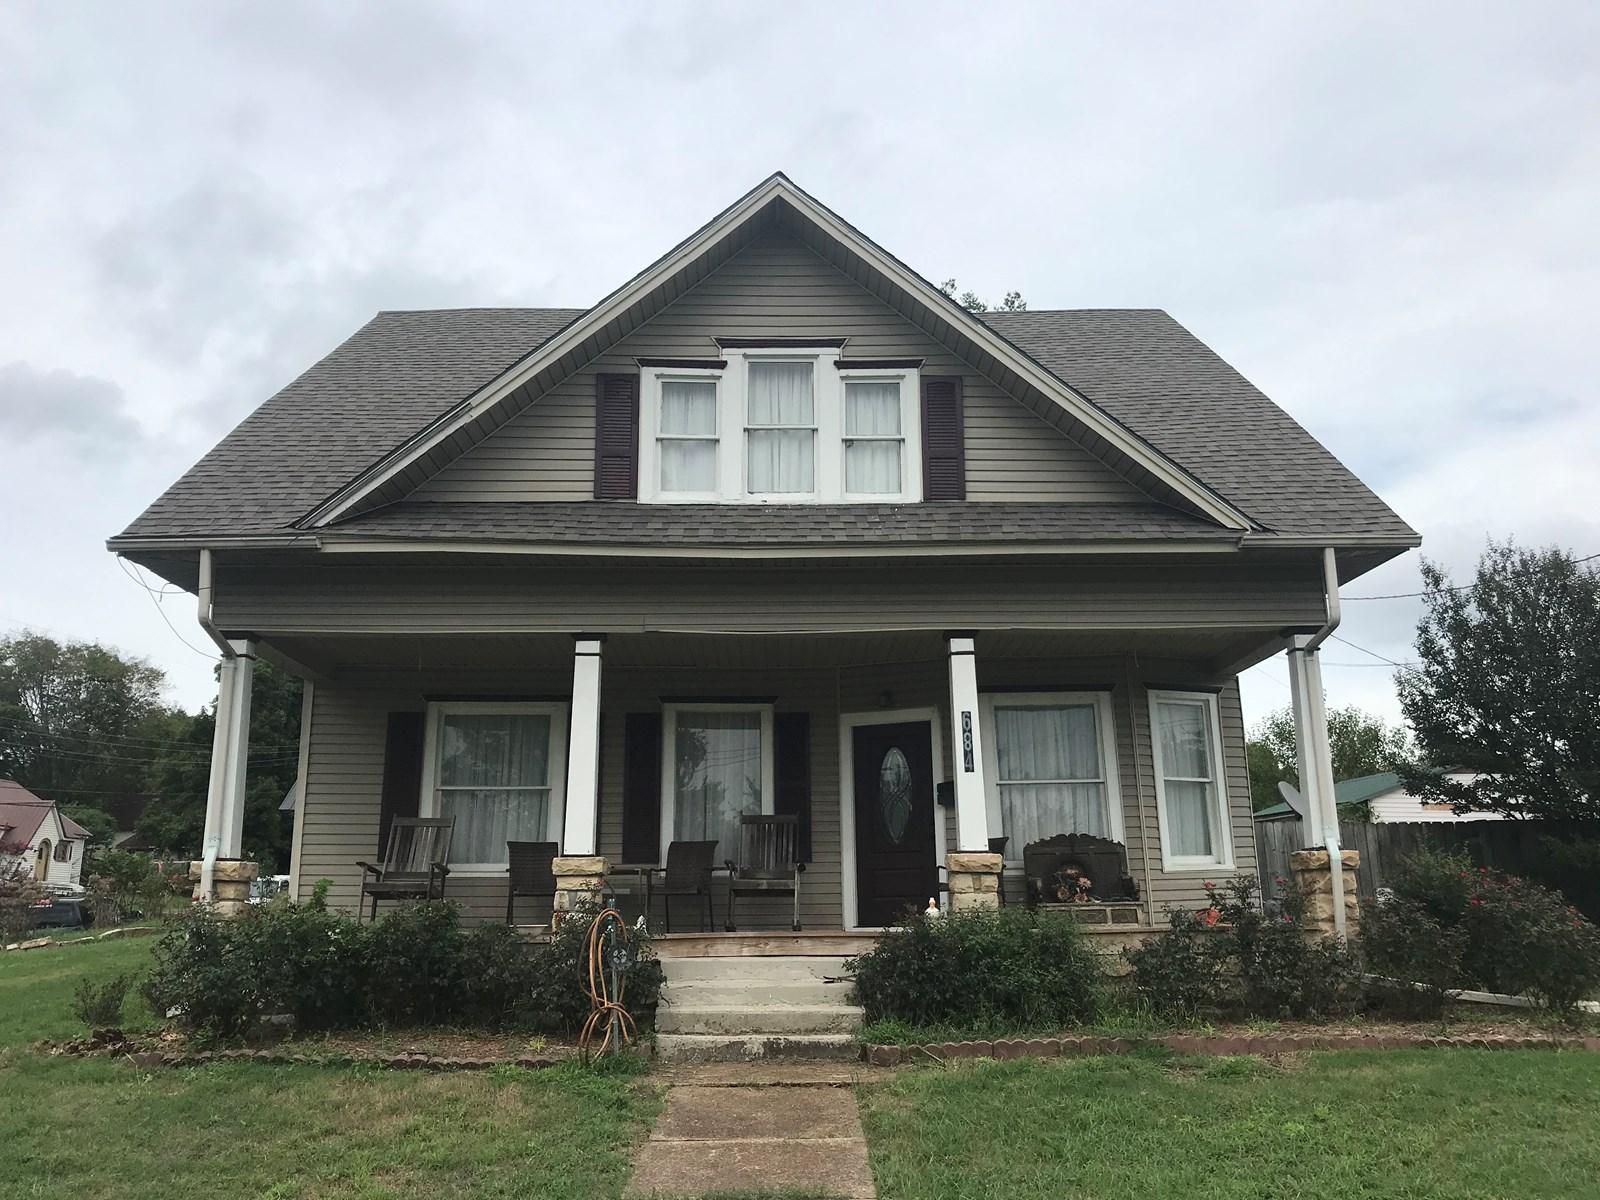 Home in Batesville Arkansas